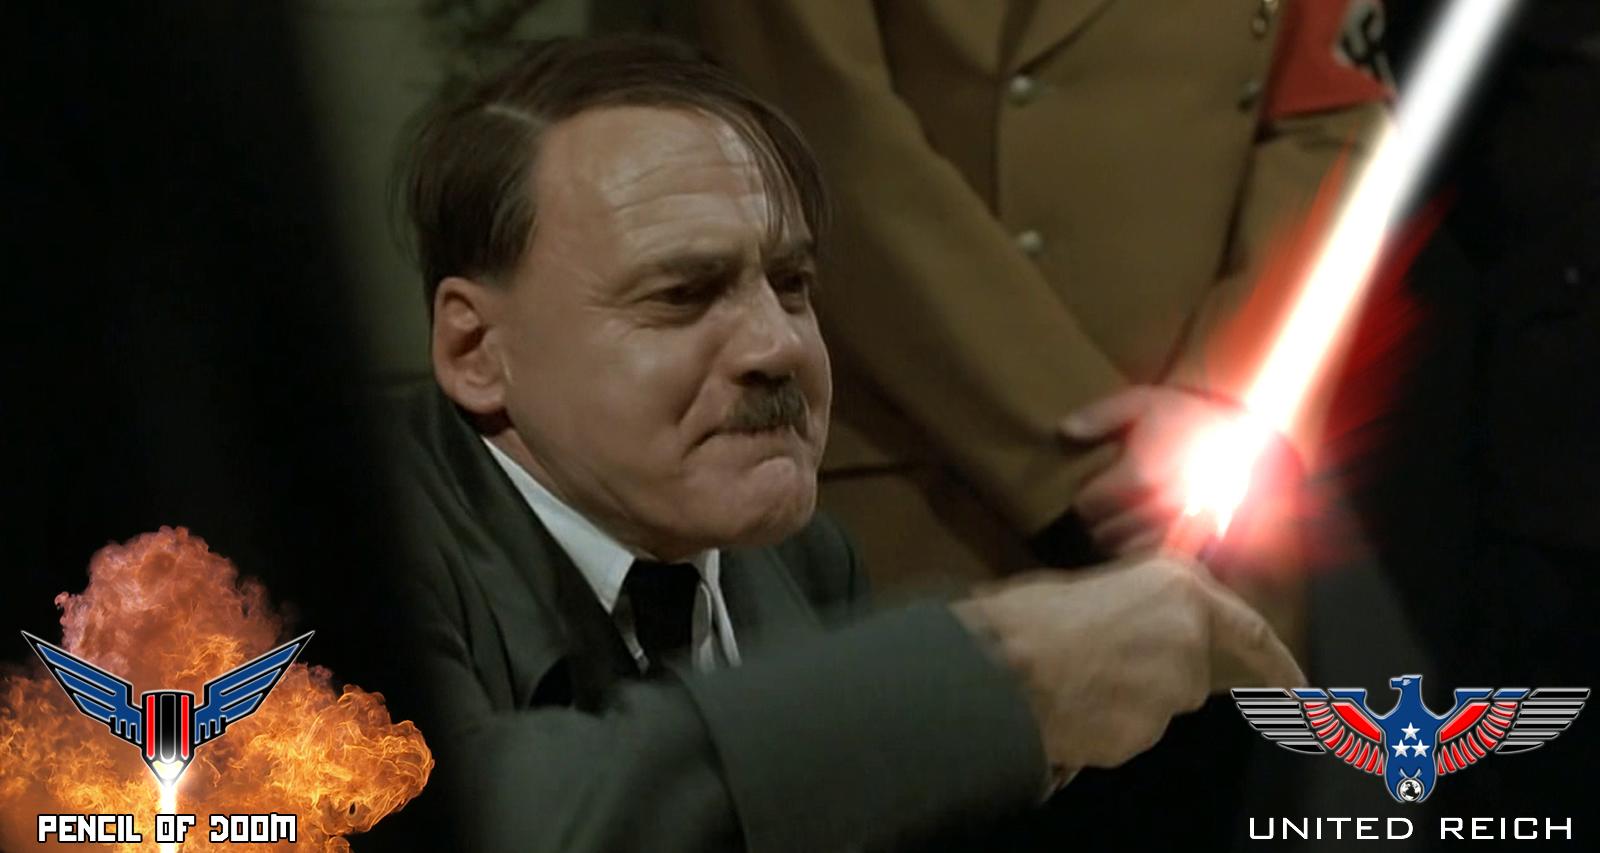 Pencil of Doom MK III   Hitler Rants Parodies Wiki   Fandom